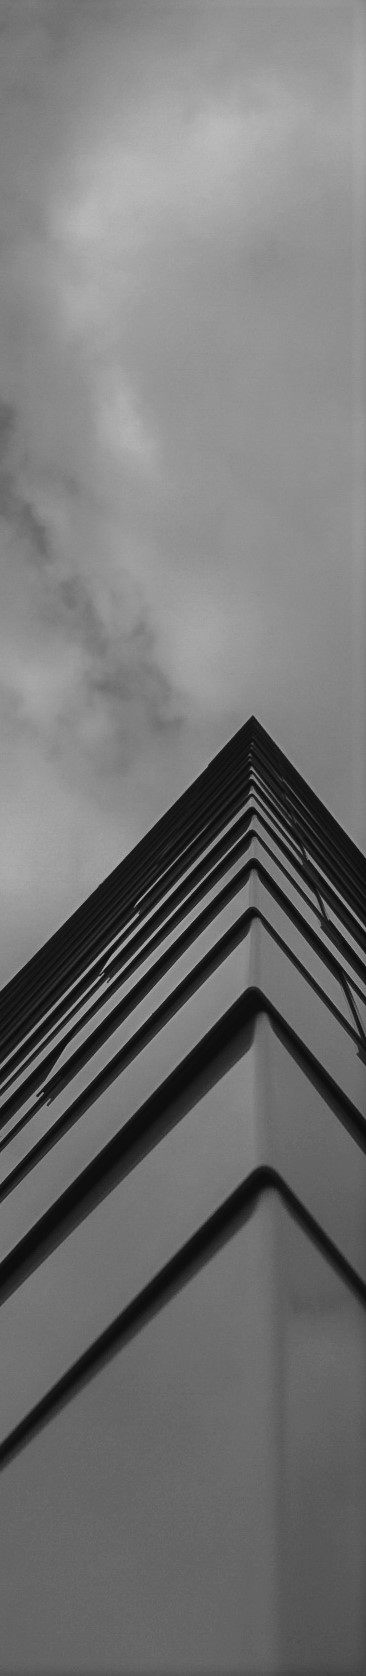 Decorative building exterior black and white